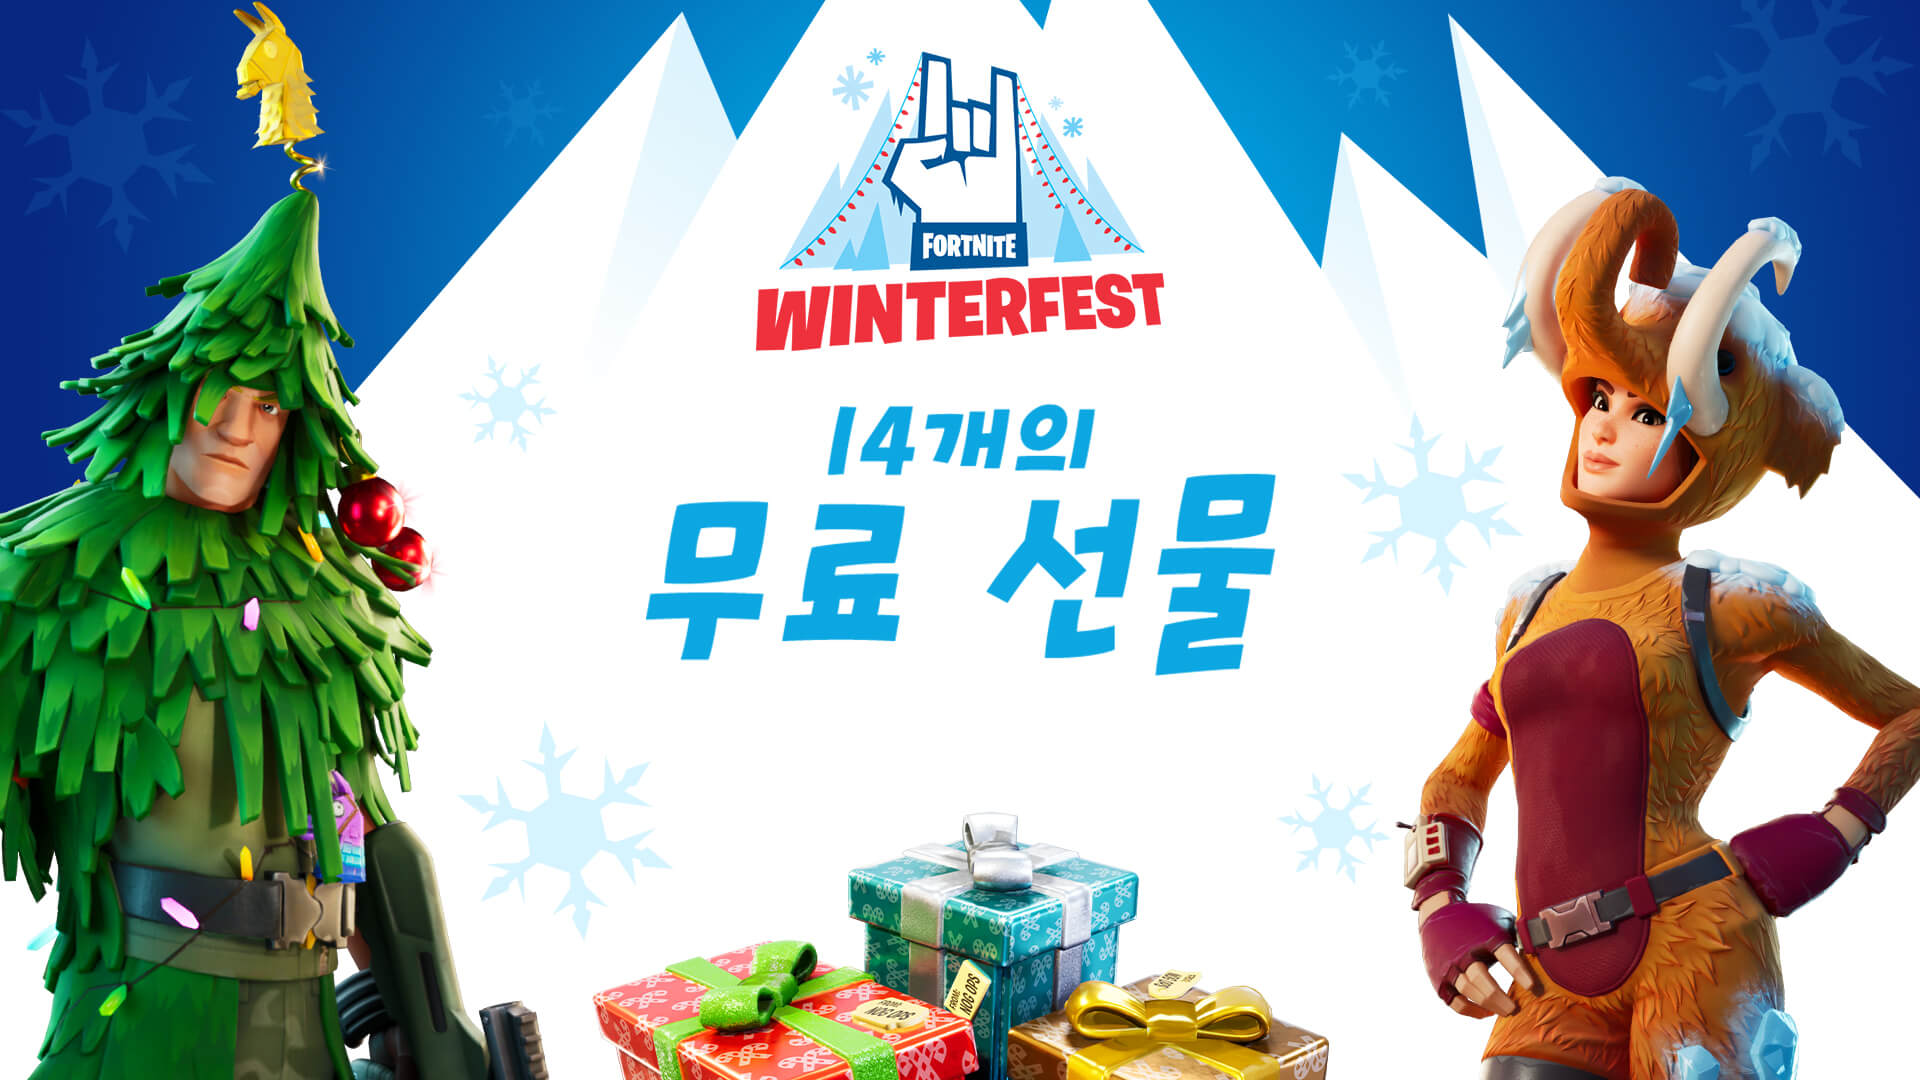 KR_11BR_WinterFest_Announce_Social.jpg